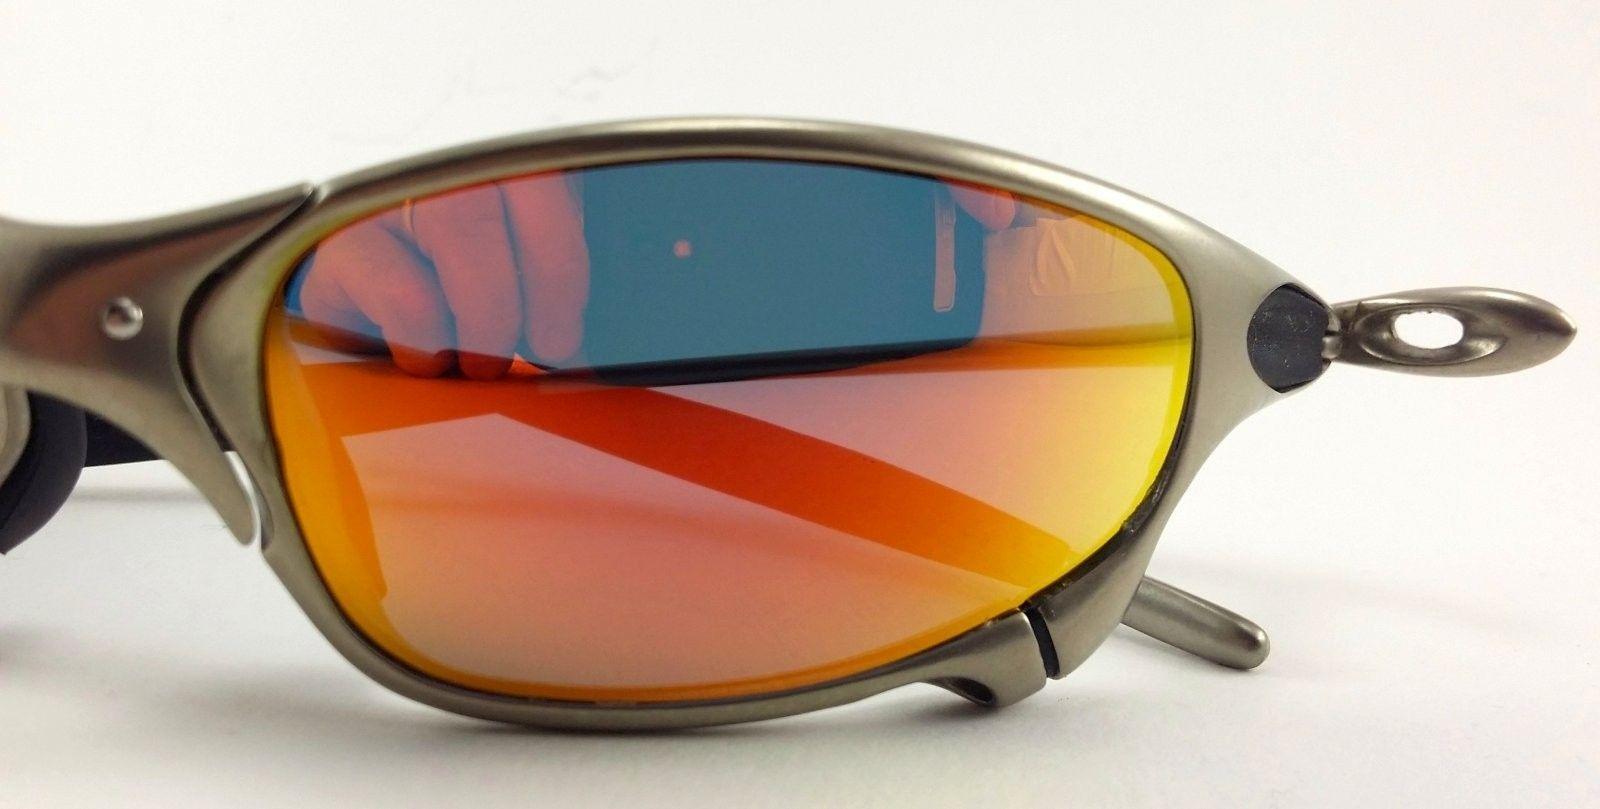 Like New Plasma Juliet W/ New RUBY Lenses *$OLD* - Fire3.jpeg